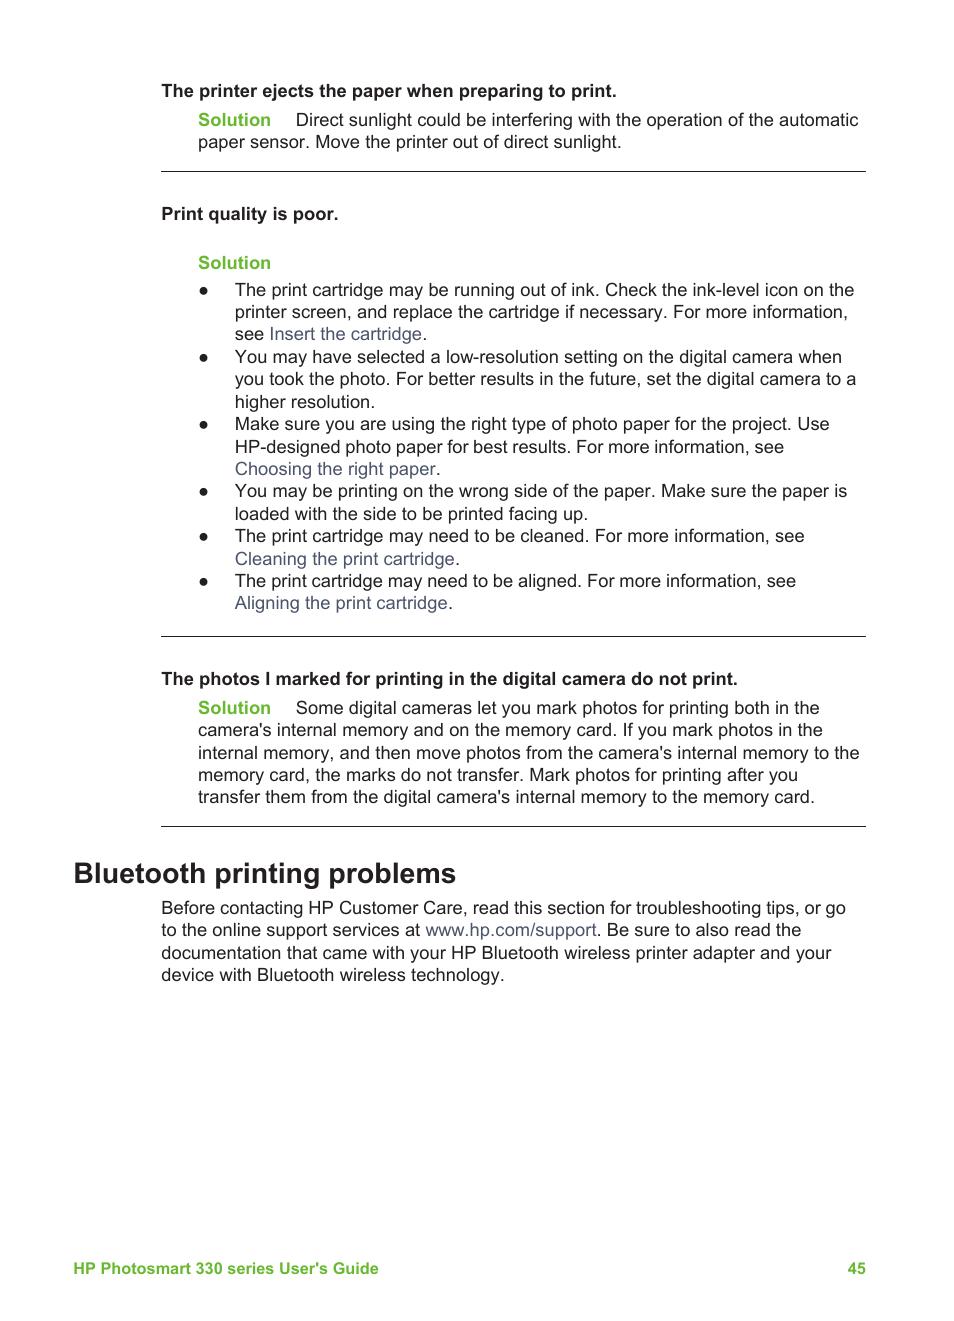 Bluetooth printing problems | HP Photosmart 335 Compact